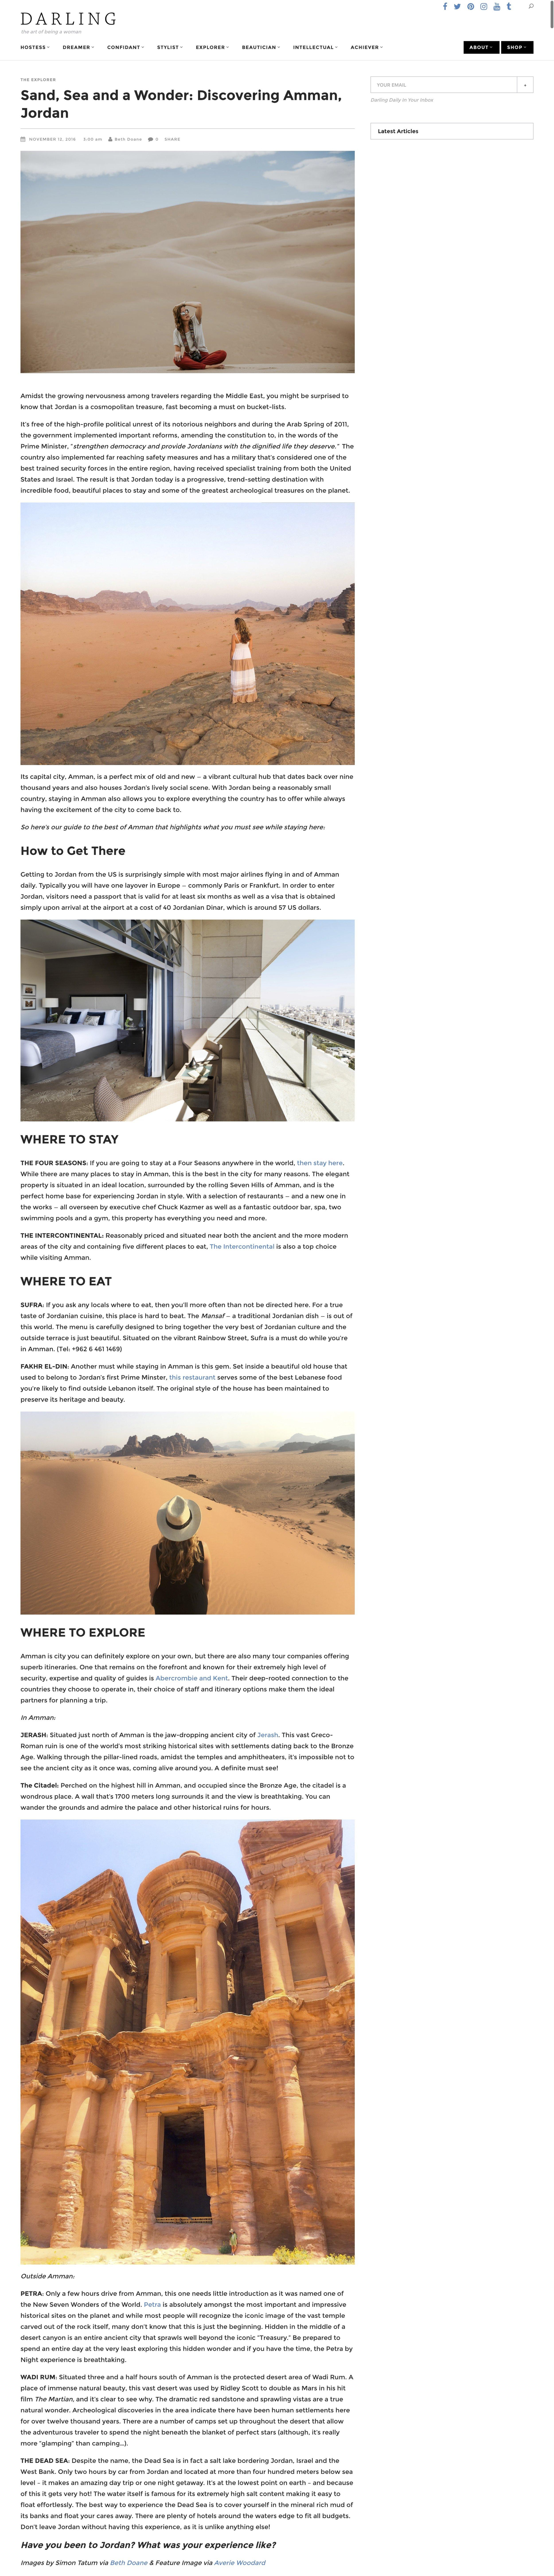 darlingmagazine-sand-sea-wonder-discovering-amman-jordan- copy.jpg